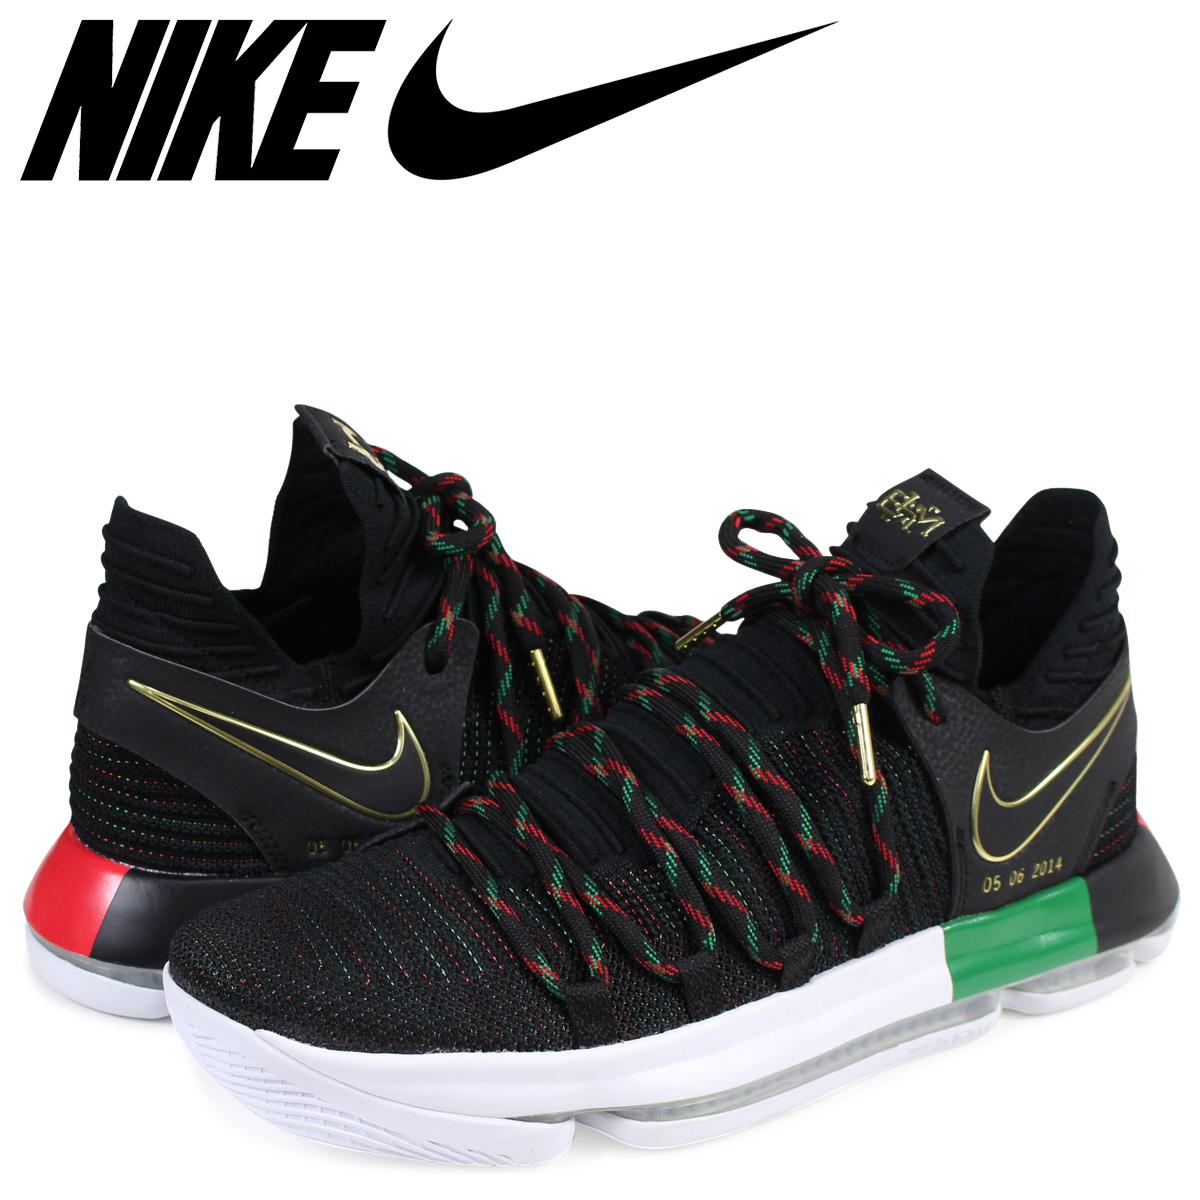 f9f783a26e6a ALLSPORTS  NIKE ZOOM KD 10 LMTD EP BHM Nike KD10 sneakers men AA4197 ...